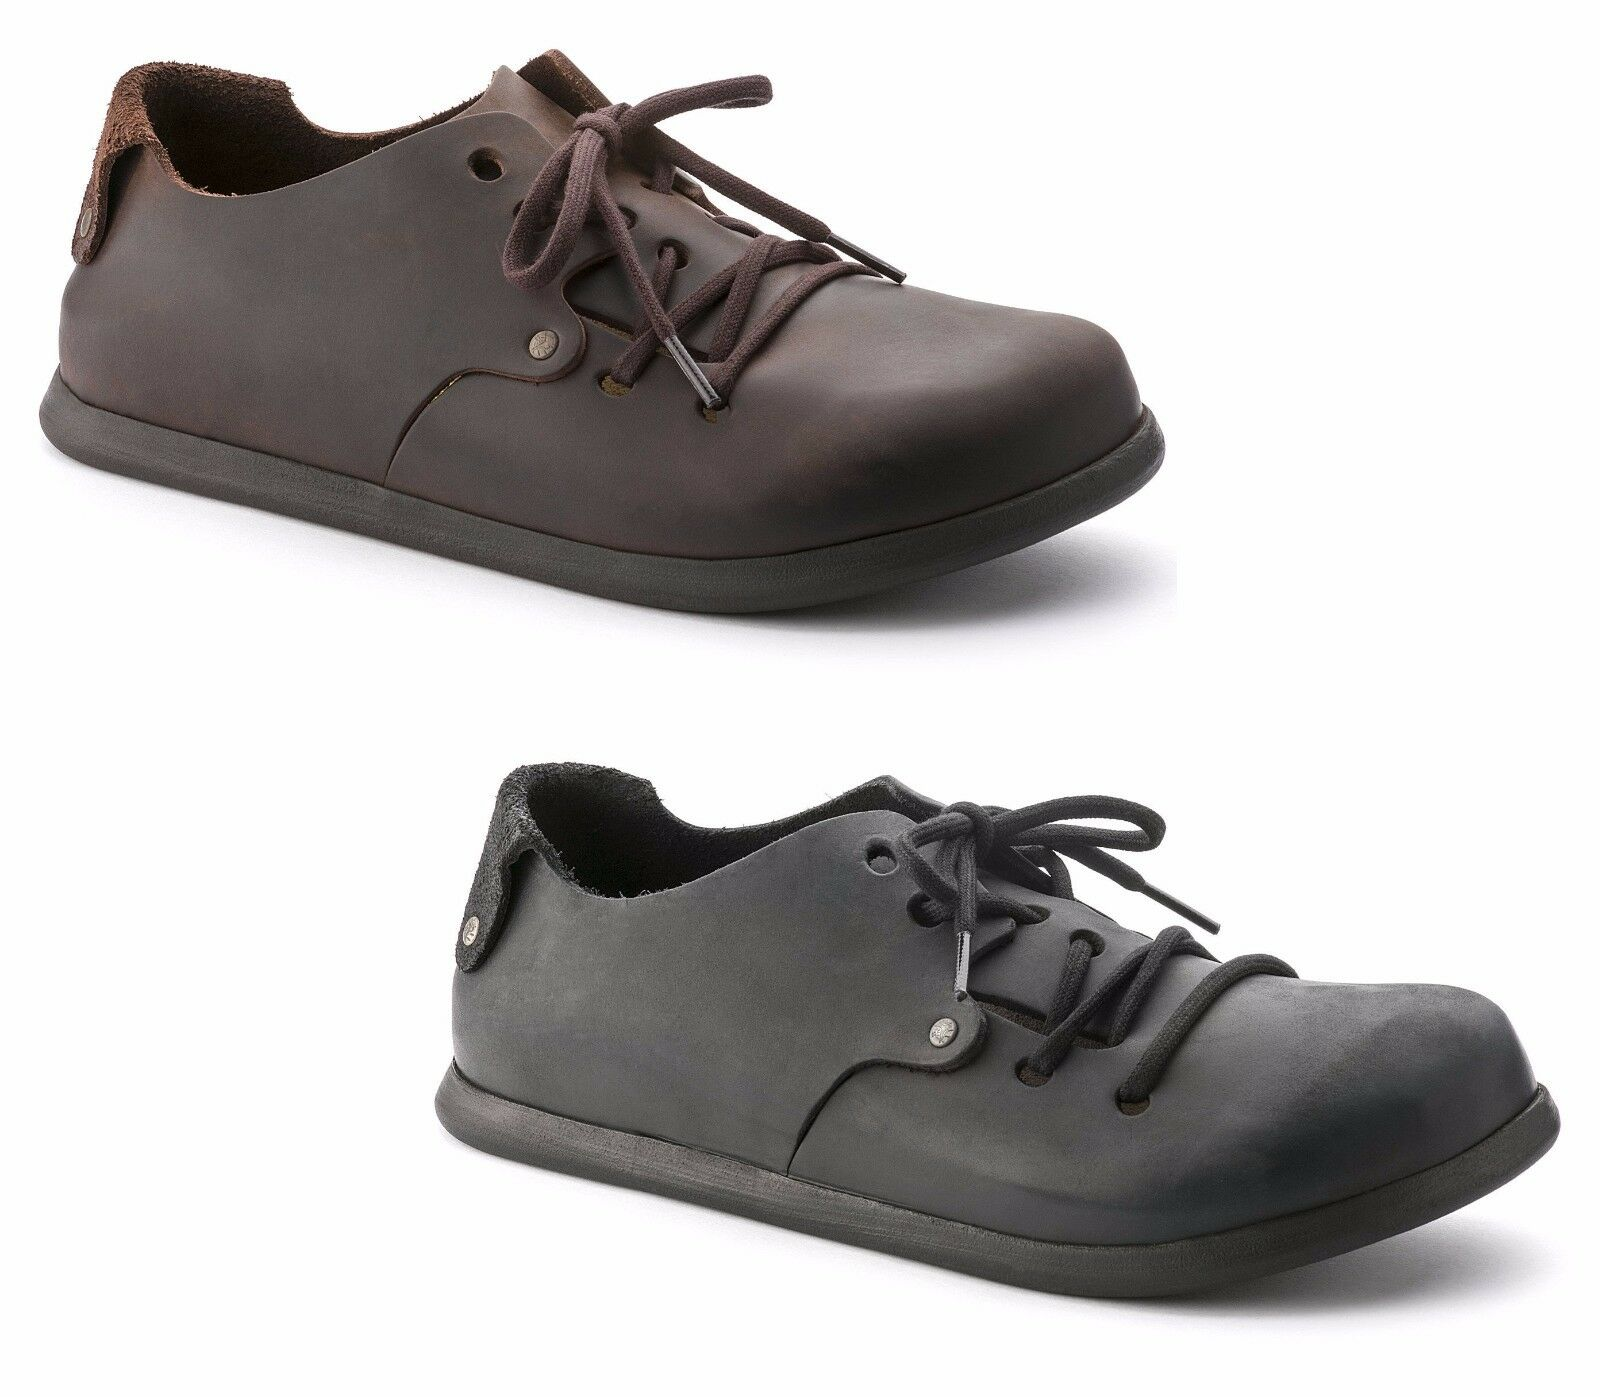 Zapatos  AL BIRKENSTOCK MONTANA HABANA Negro DAL 35 AL  46 hombre mujer UNISEX PELLE 613c11